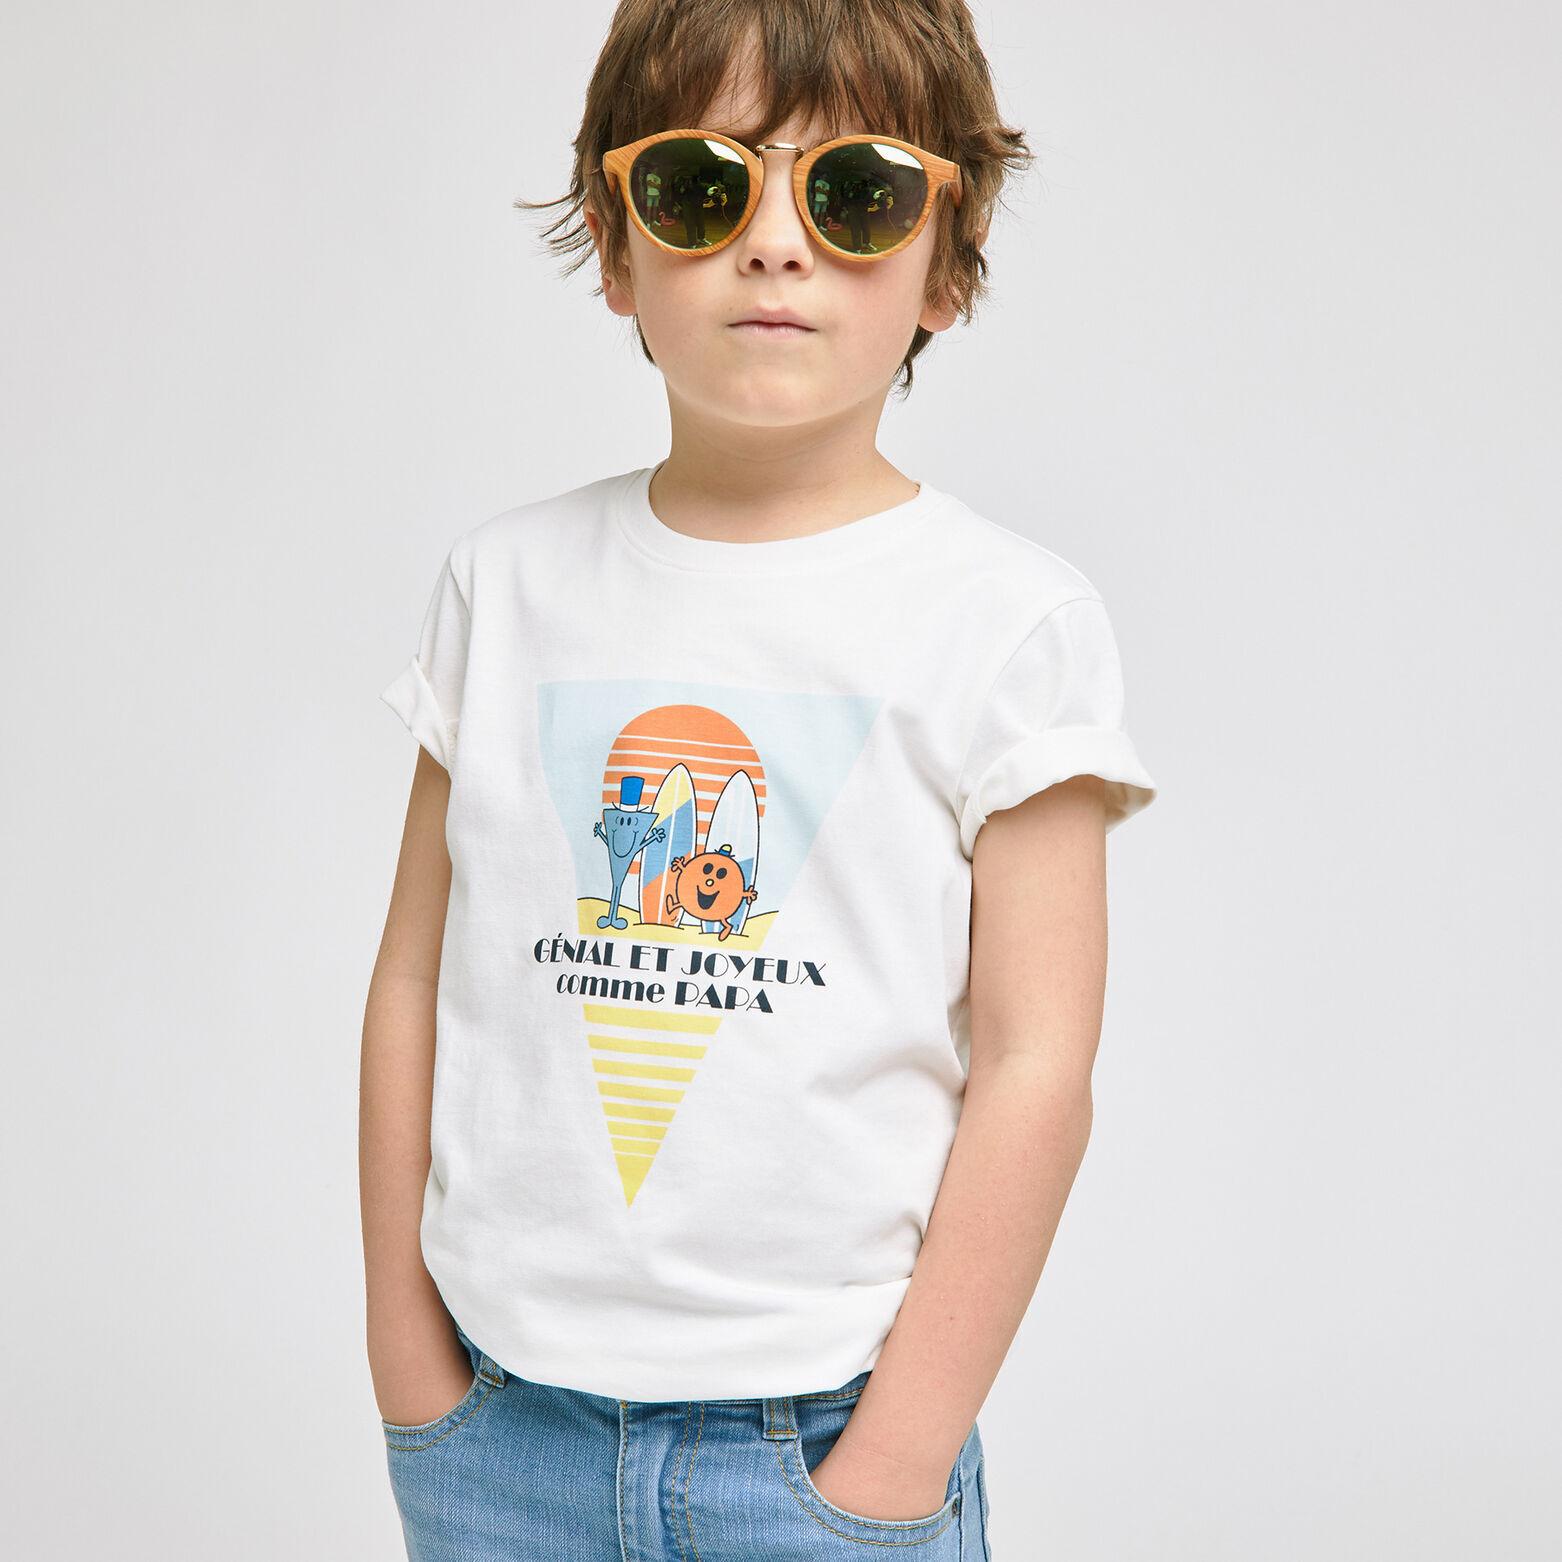 Ensemble mini moi tee shirt licence Mr Mme - Blanc